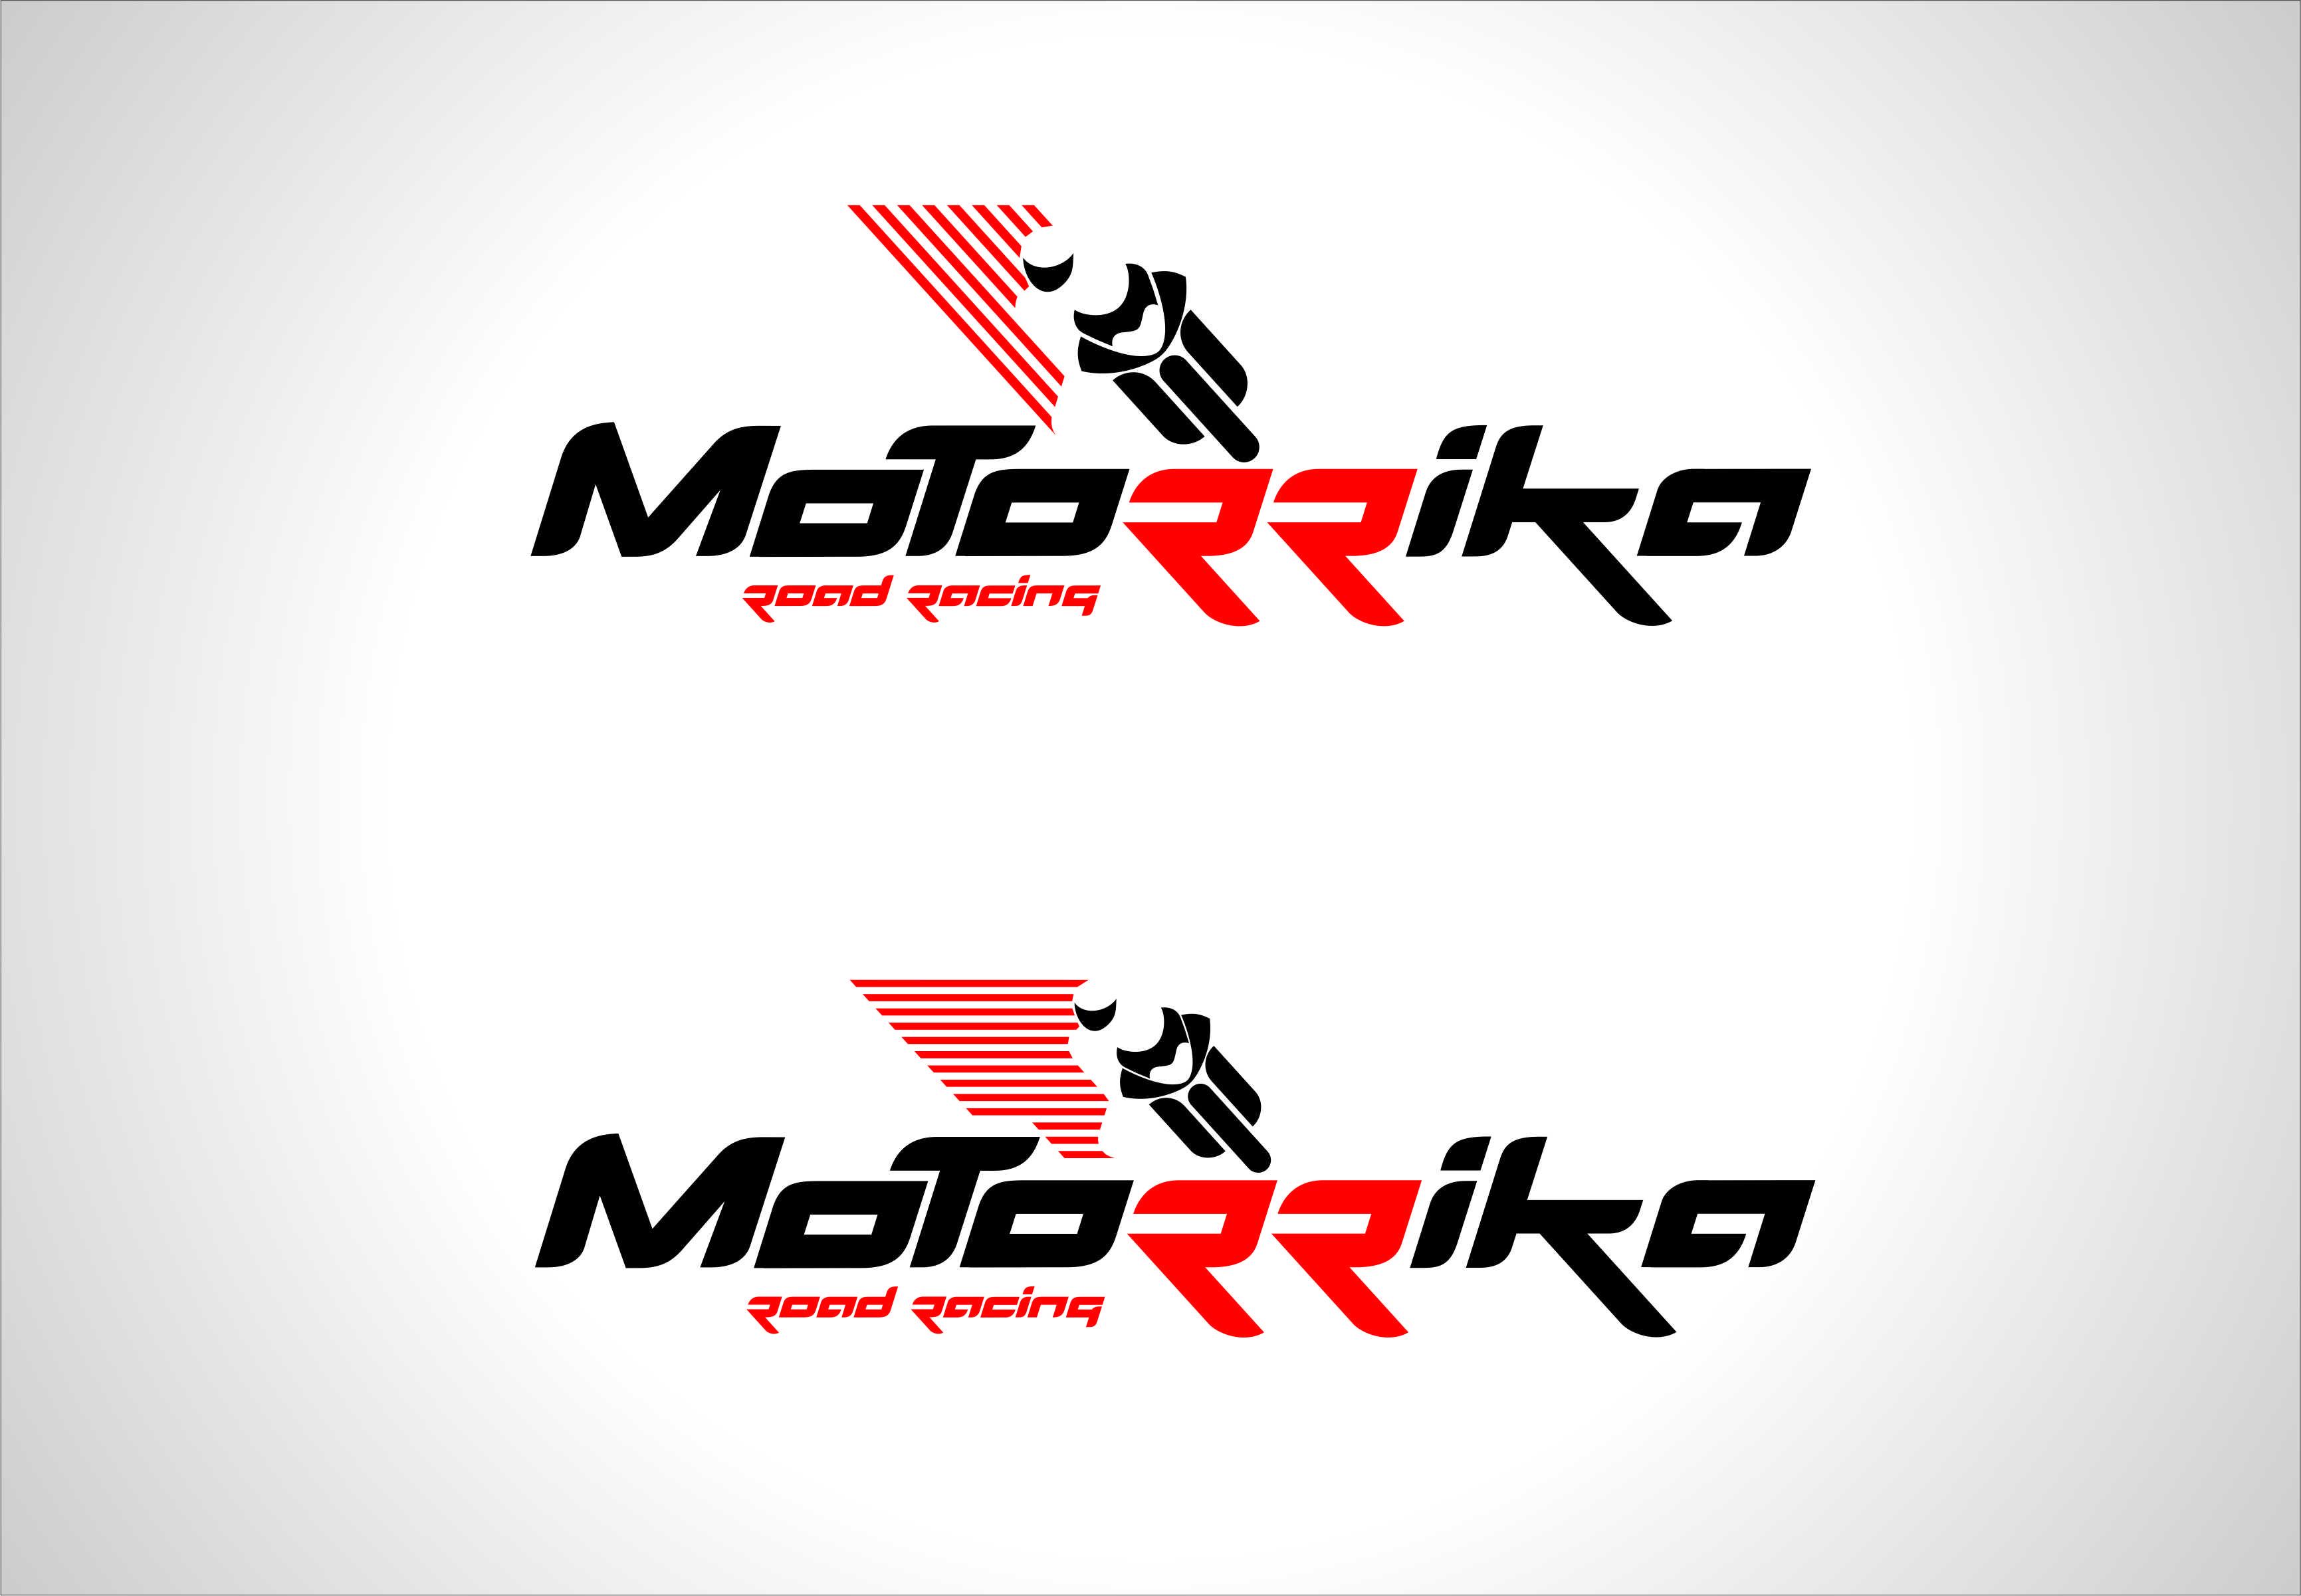 Мотогонки. Логотип, фирменный стиль. фото f_4dd5063dbb267.jpg